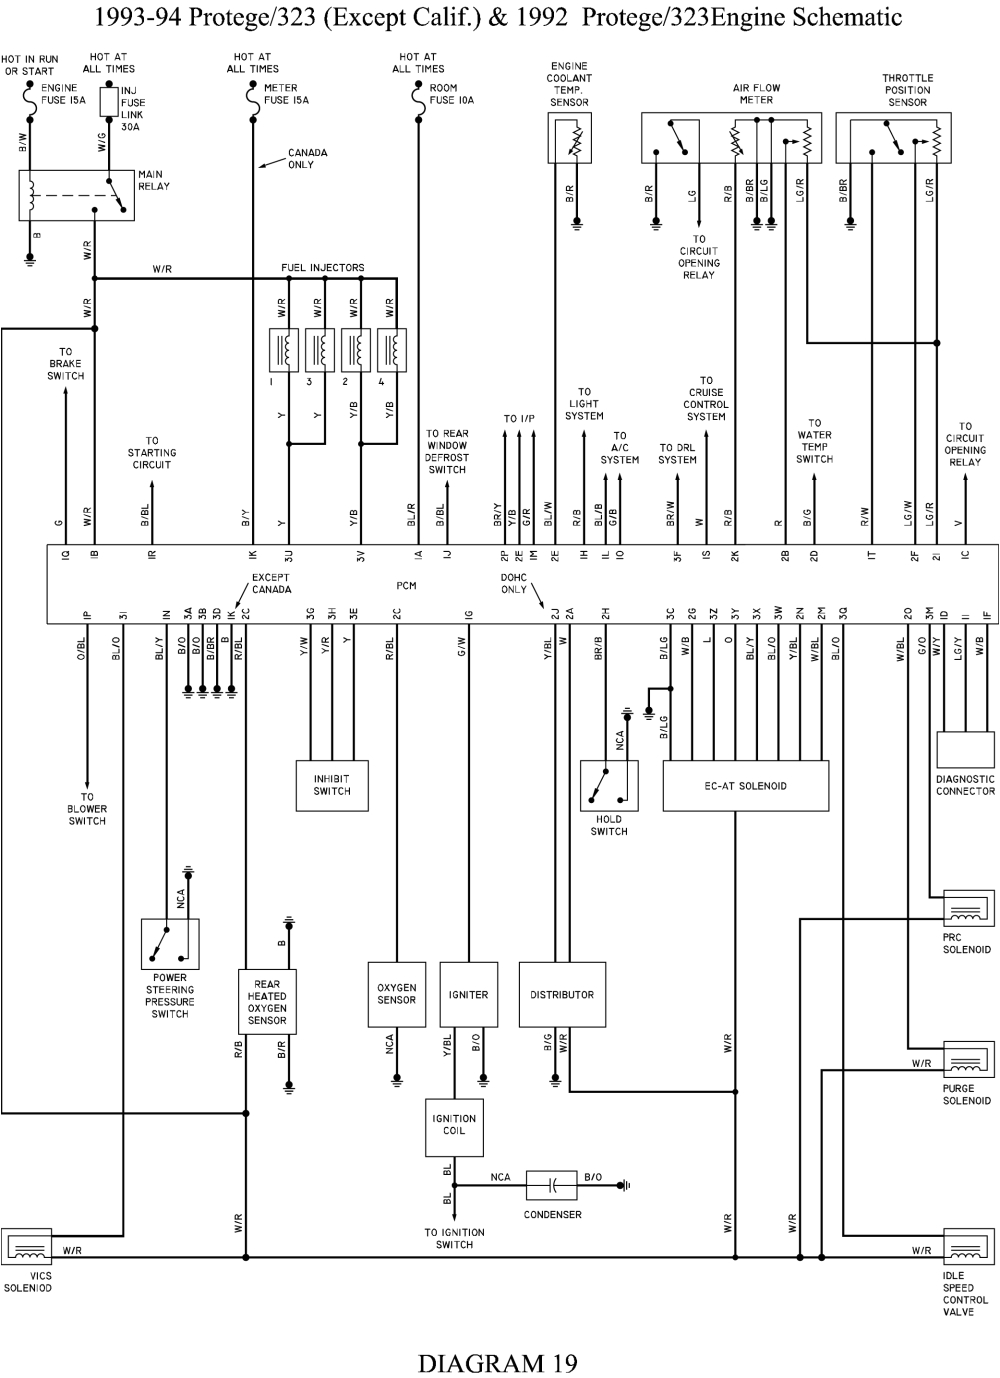 1993 mazda protege electrical wiring diagram schematics wiring rh parntesis co 2003 mazda protege mazda protege